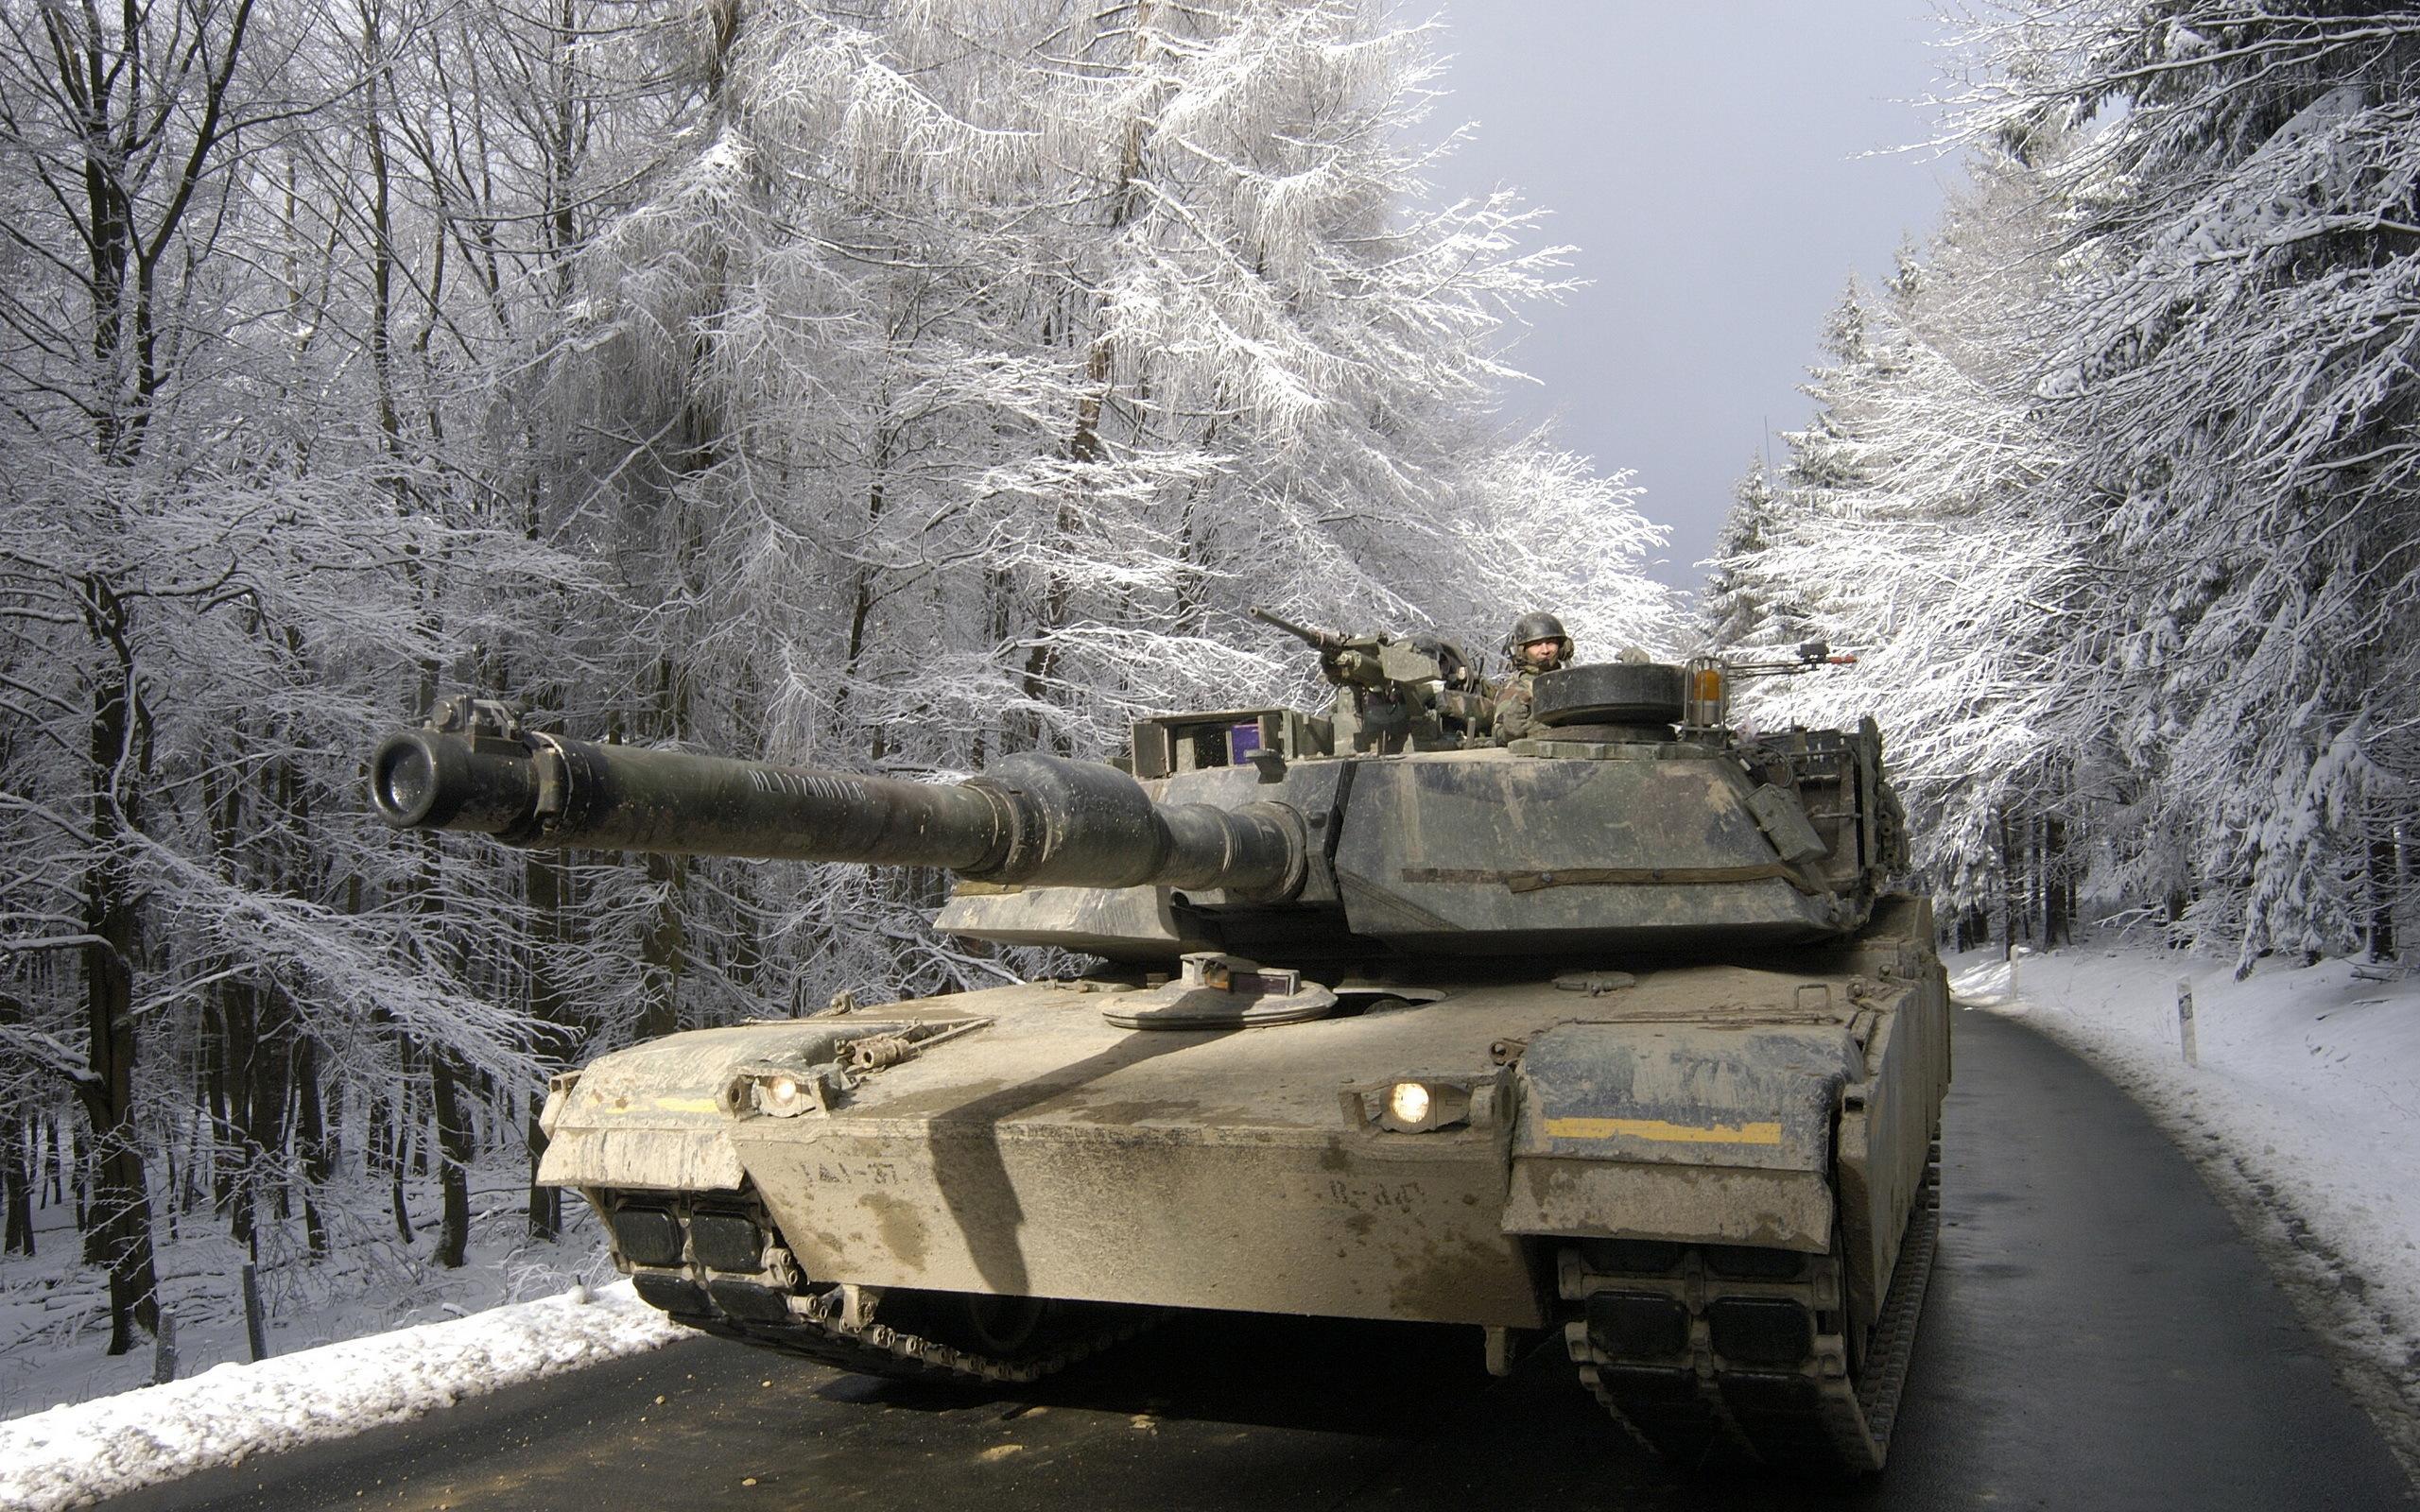 Custom Silk Photo Wallpaper Hd Military Tank Wall: Abrams Full HD Wallpaper And Background Image